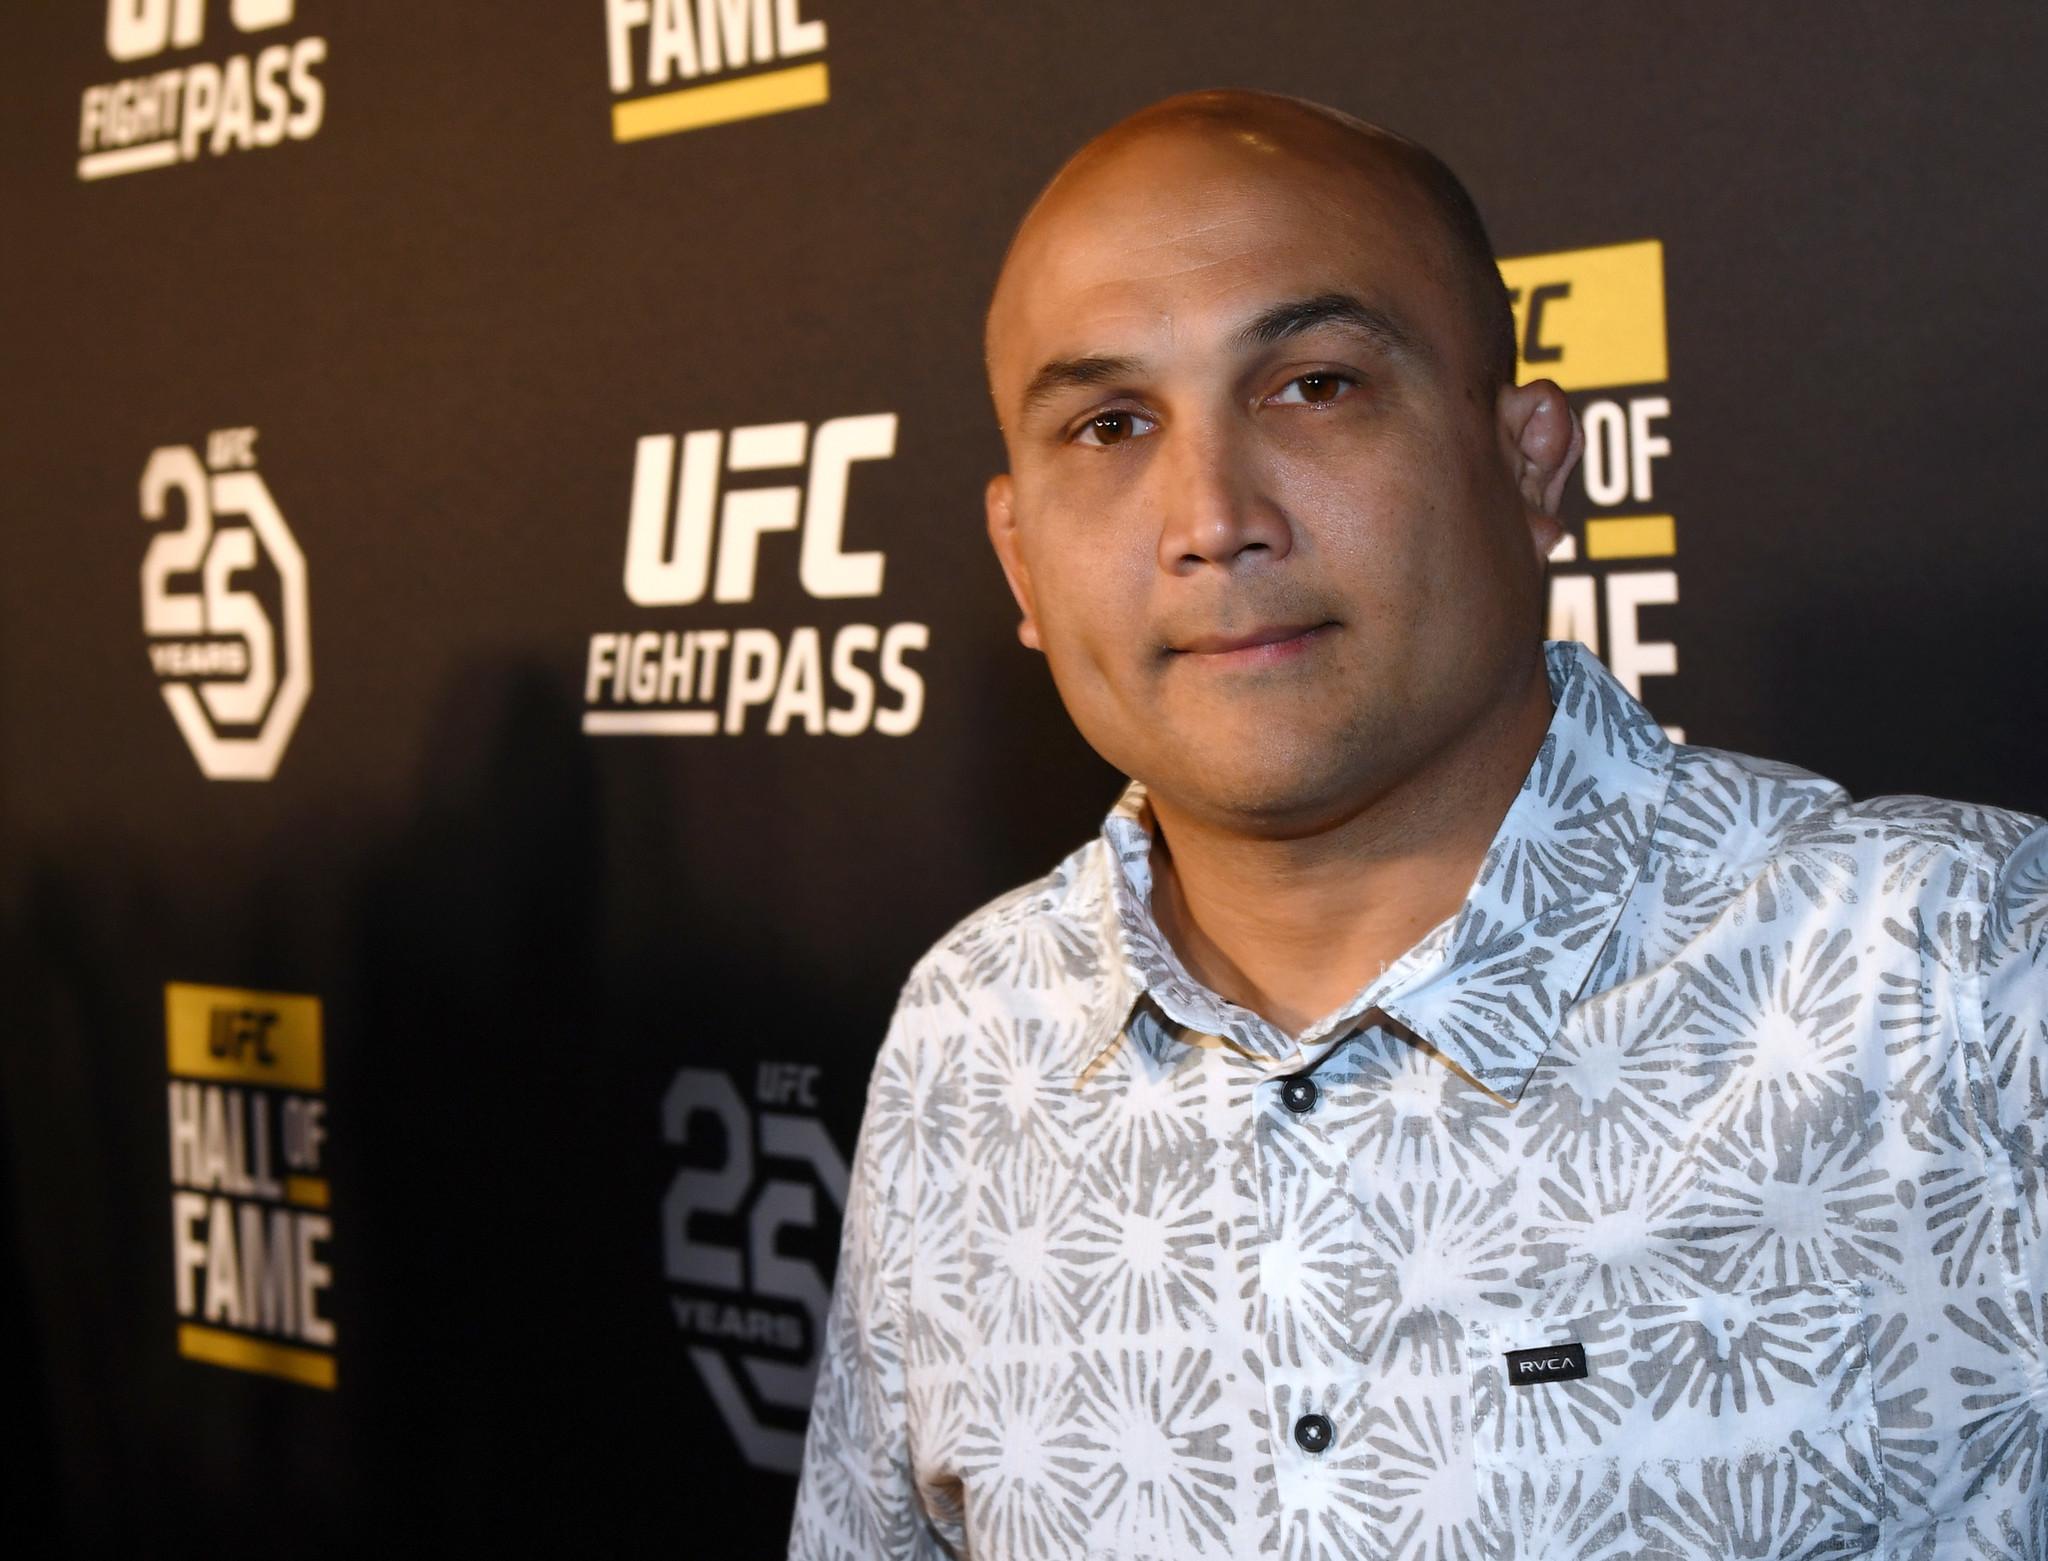 UFC star BJ Penn investigated for possible DUI after car crash